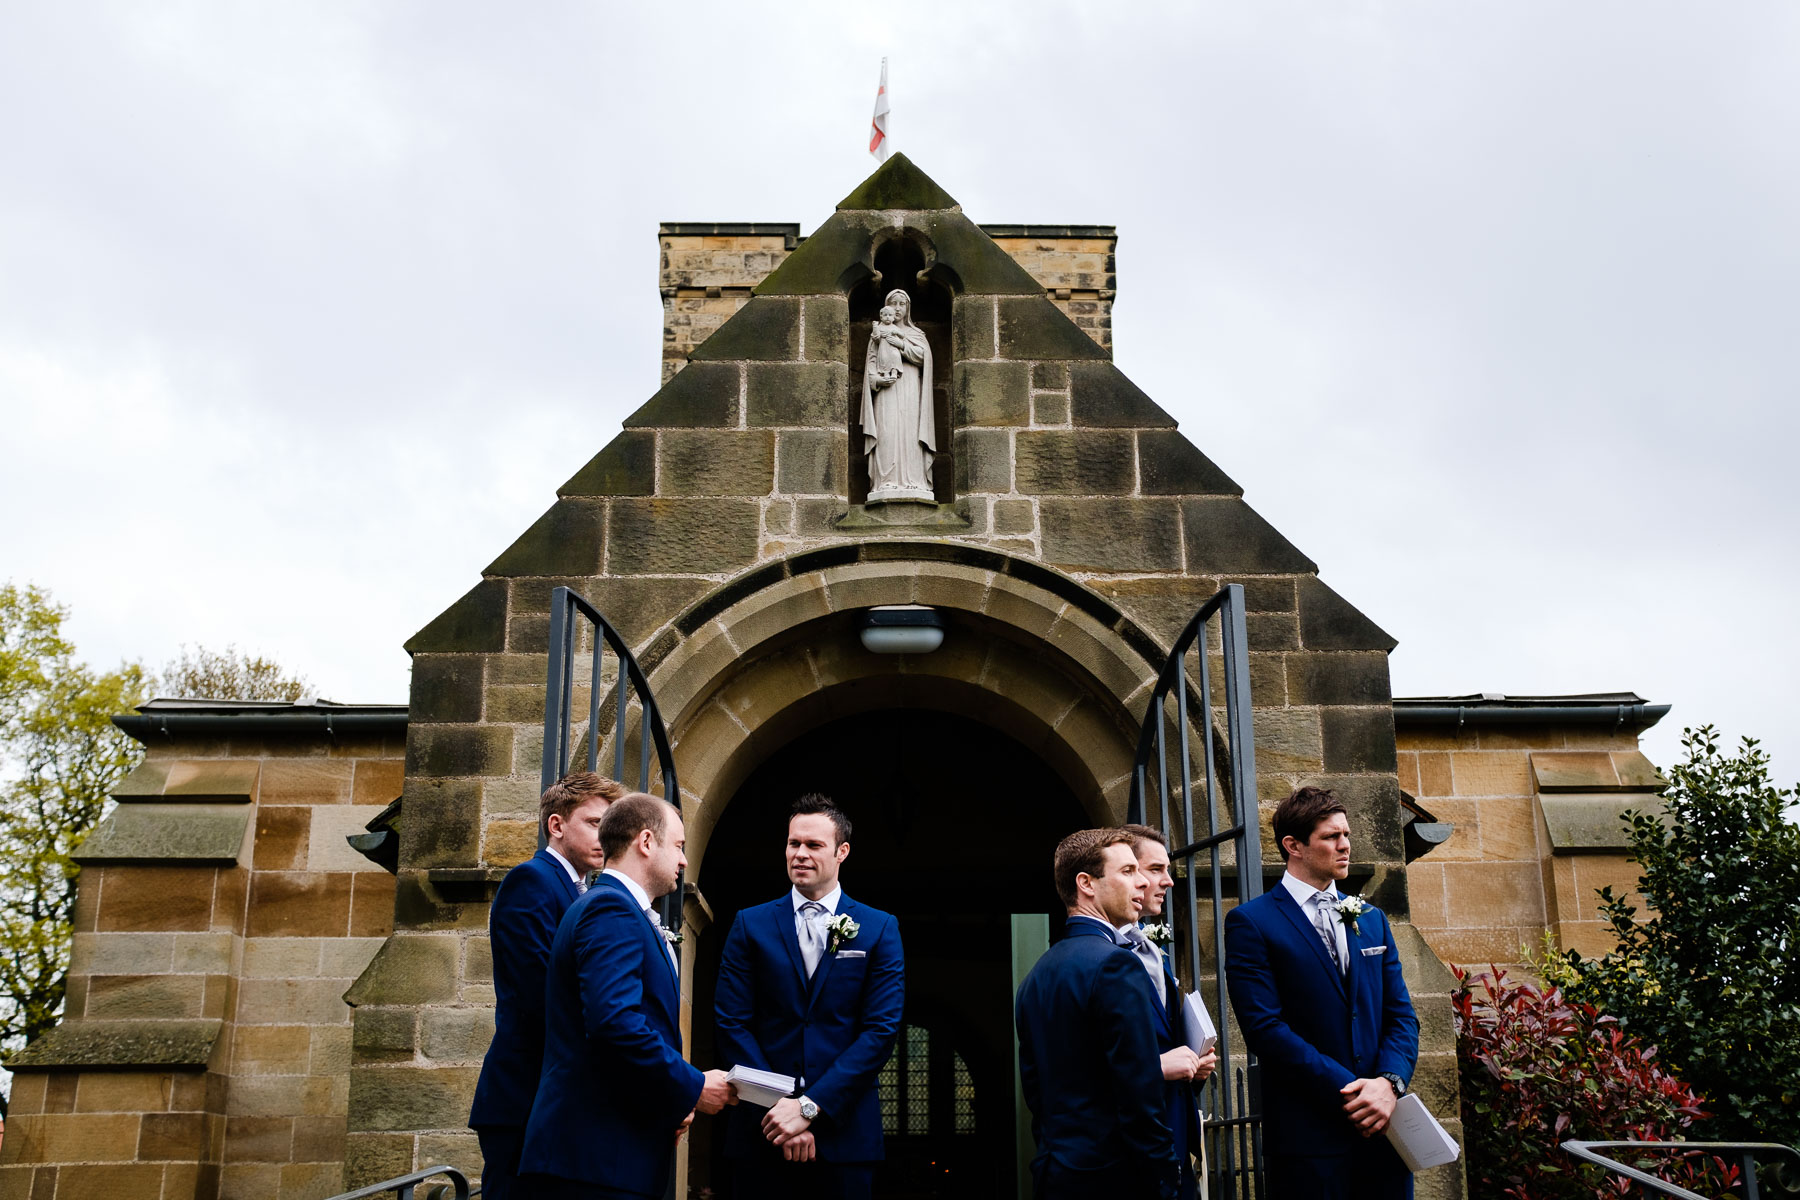 Crathorne Hall Wedding Photography - Jo & Paul (54).jpg